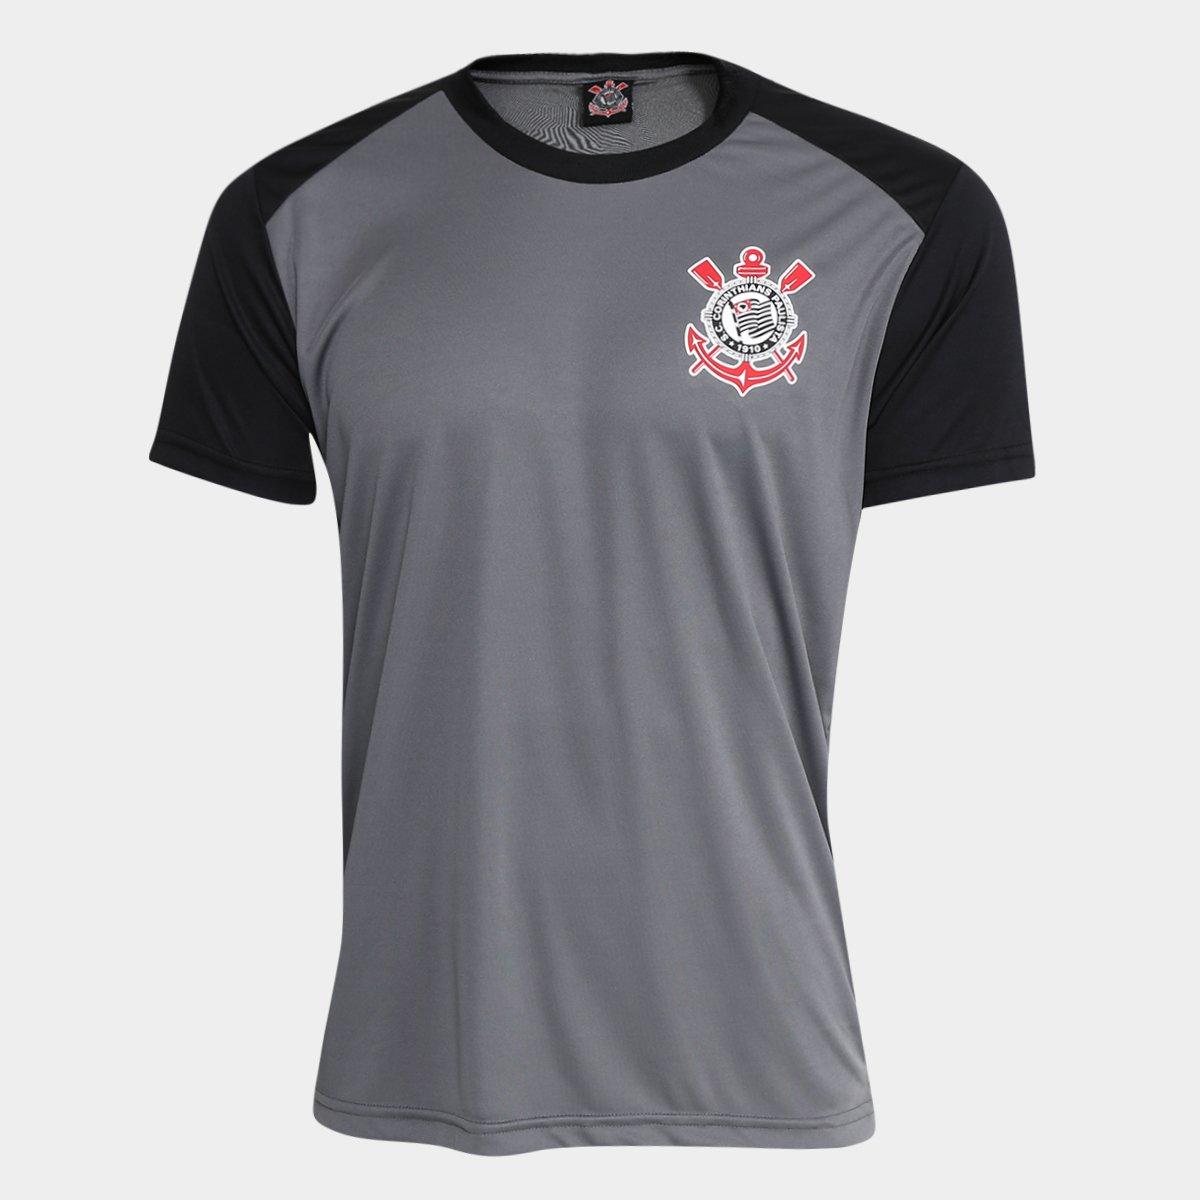 Camiseta Corinthians Oliver Masculina - Cinza e Preto - Compre Agora ... d3317609766fa